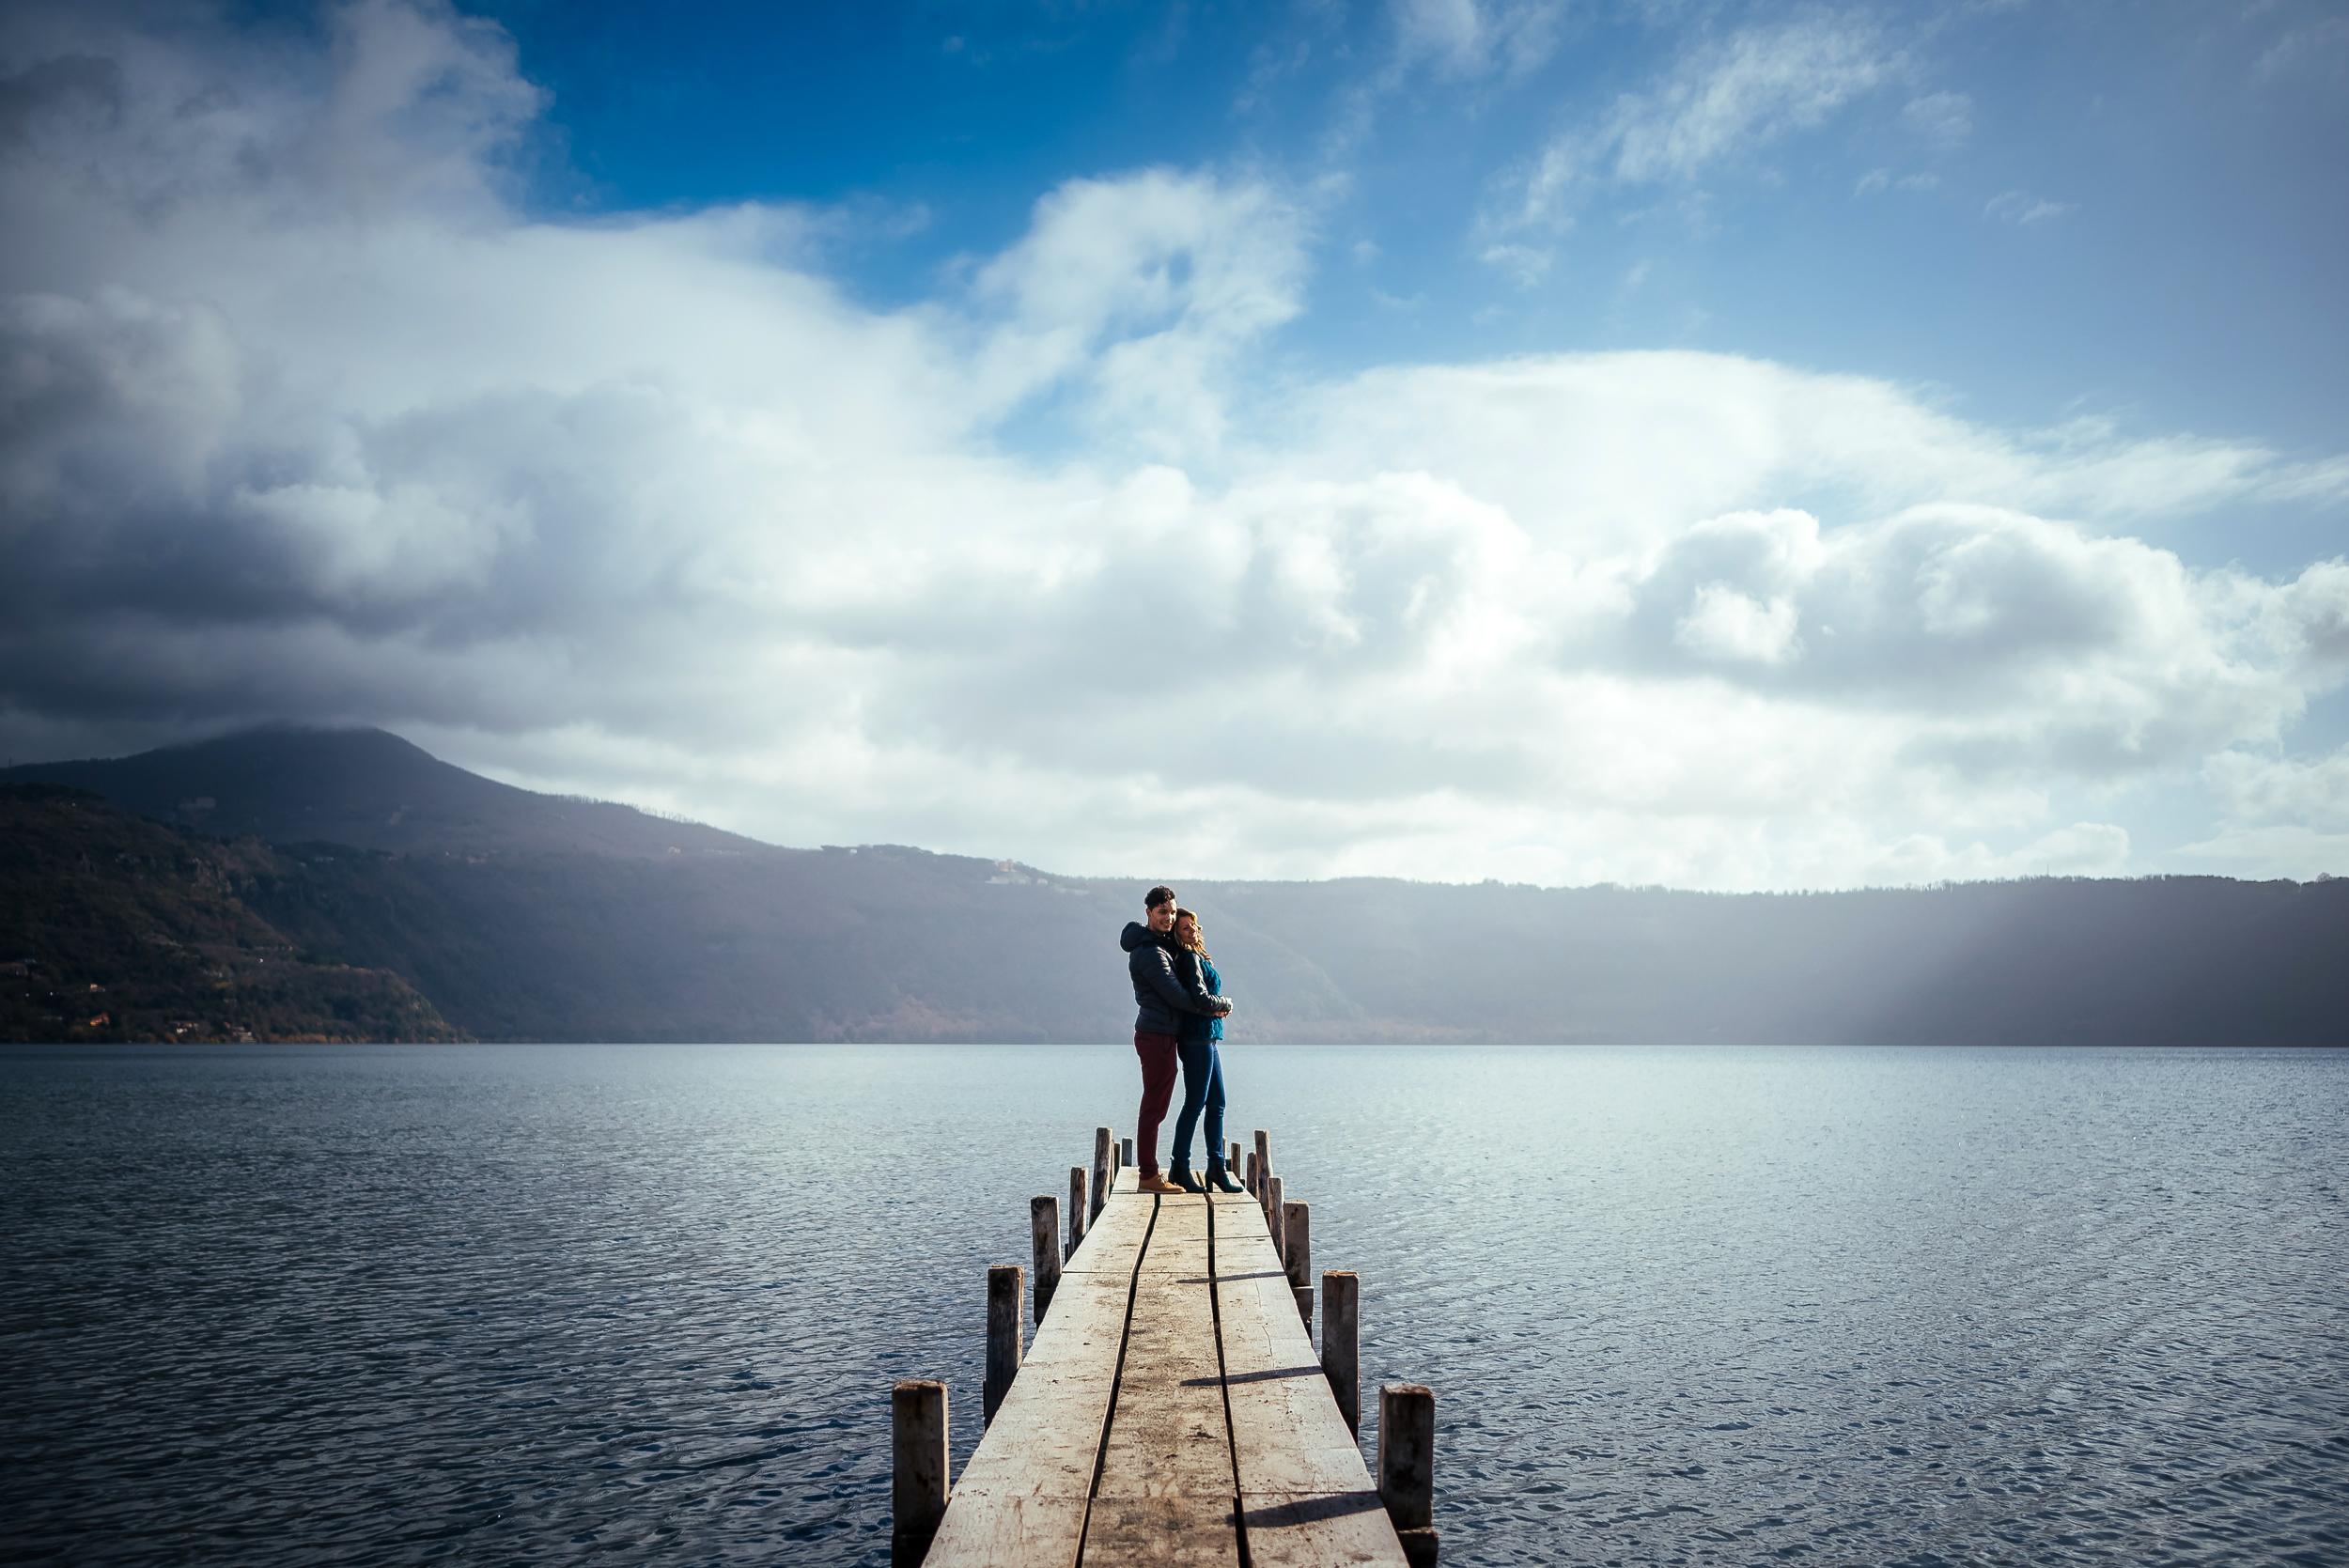 engagement-matrimonio-latina-giuseppe-deangelis-3